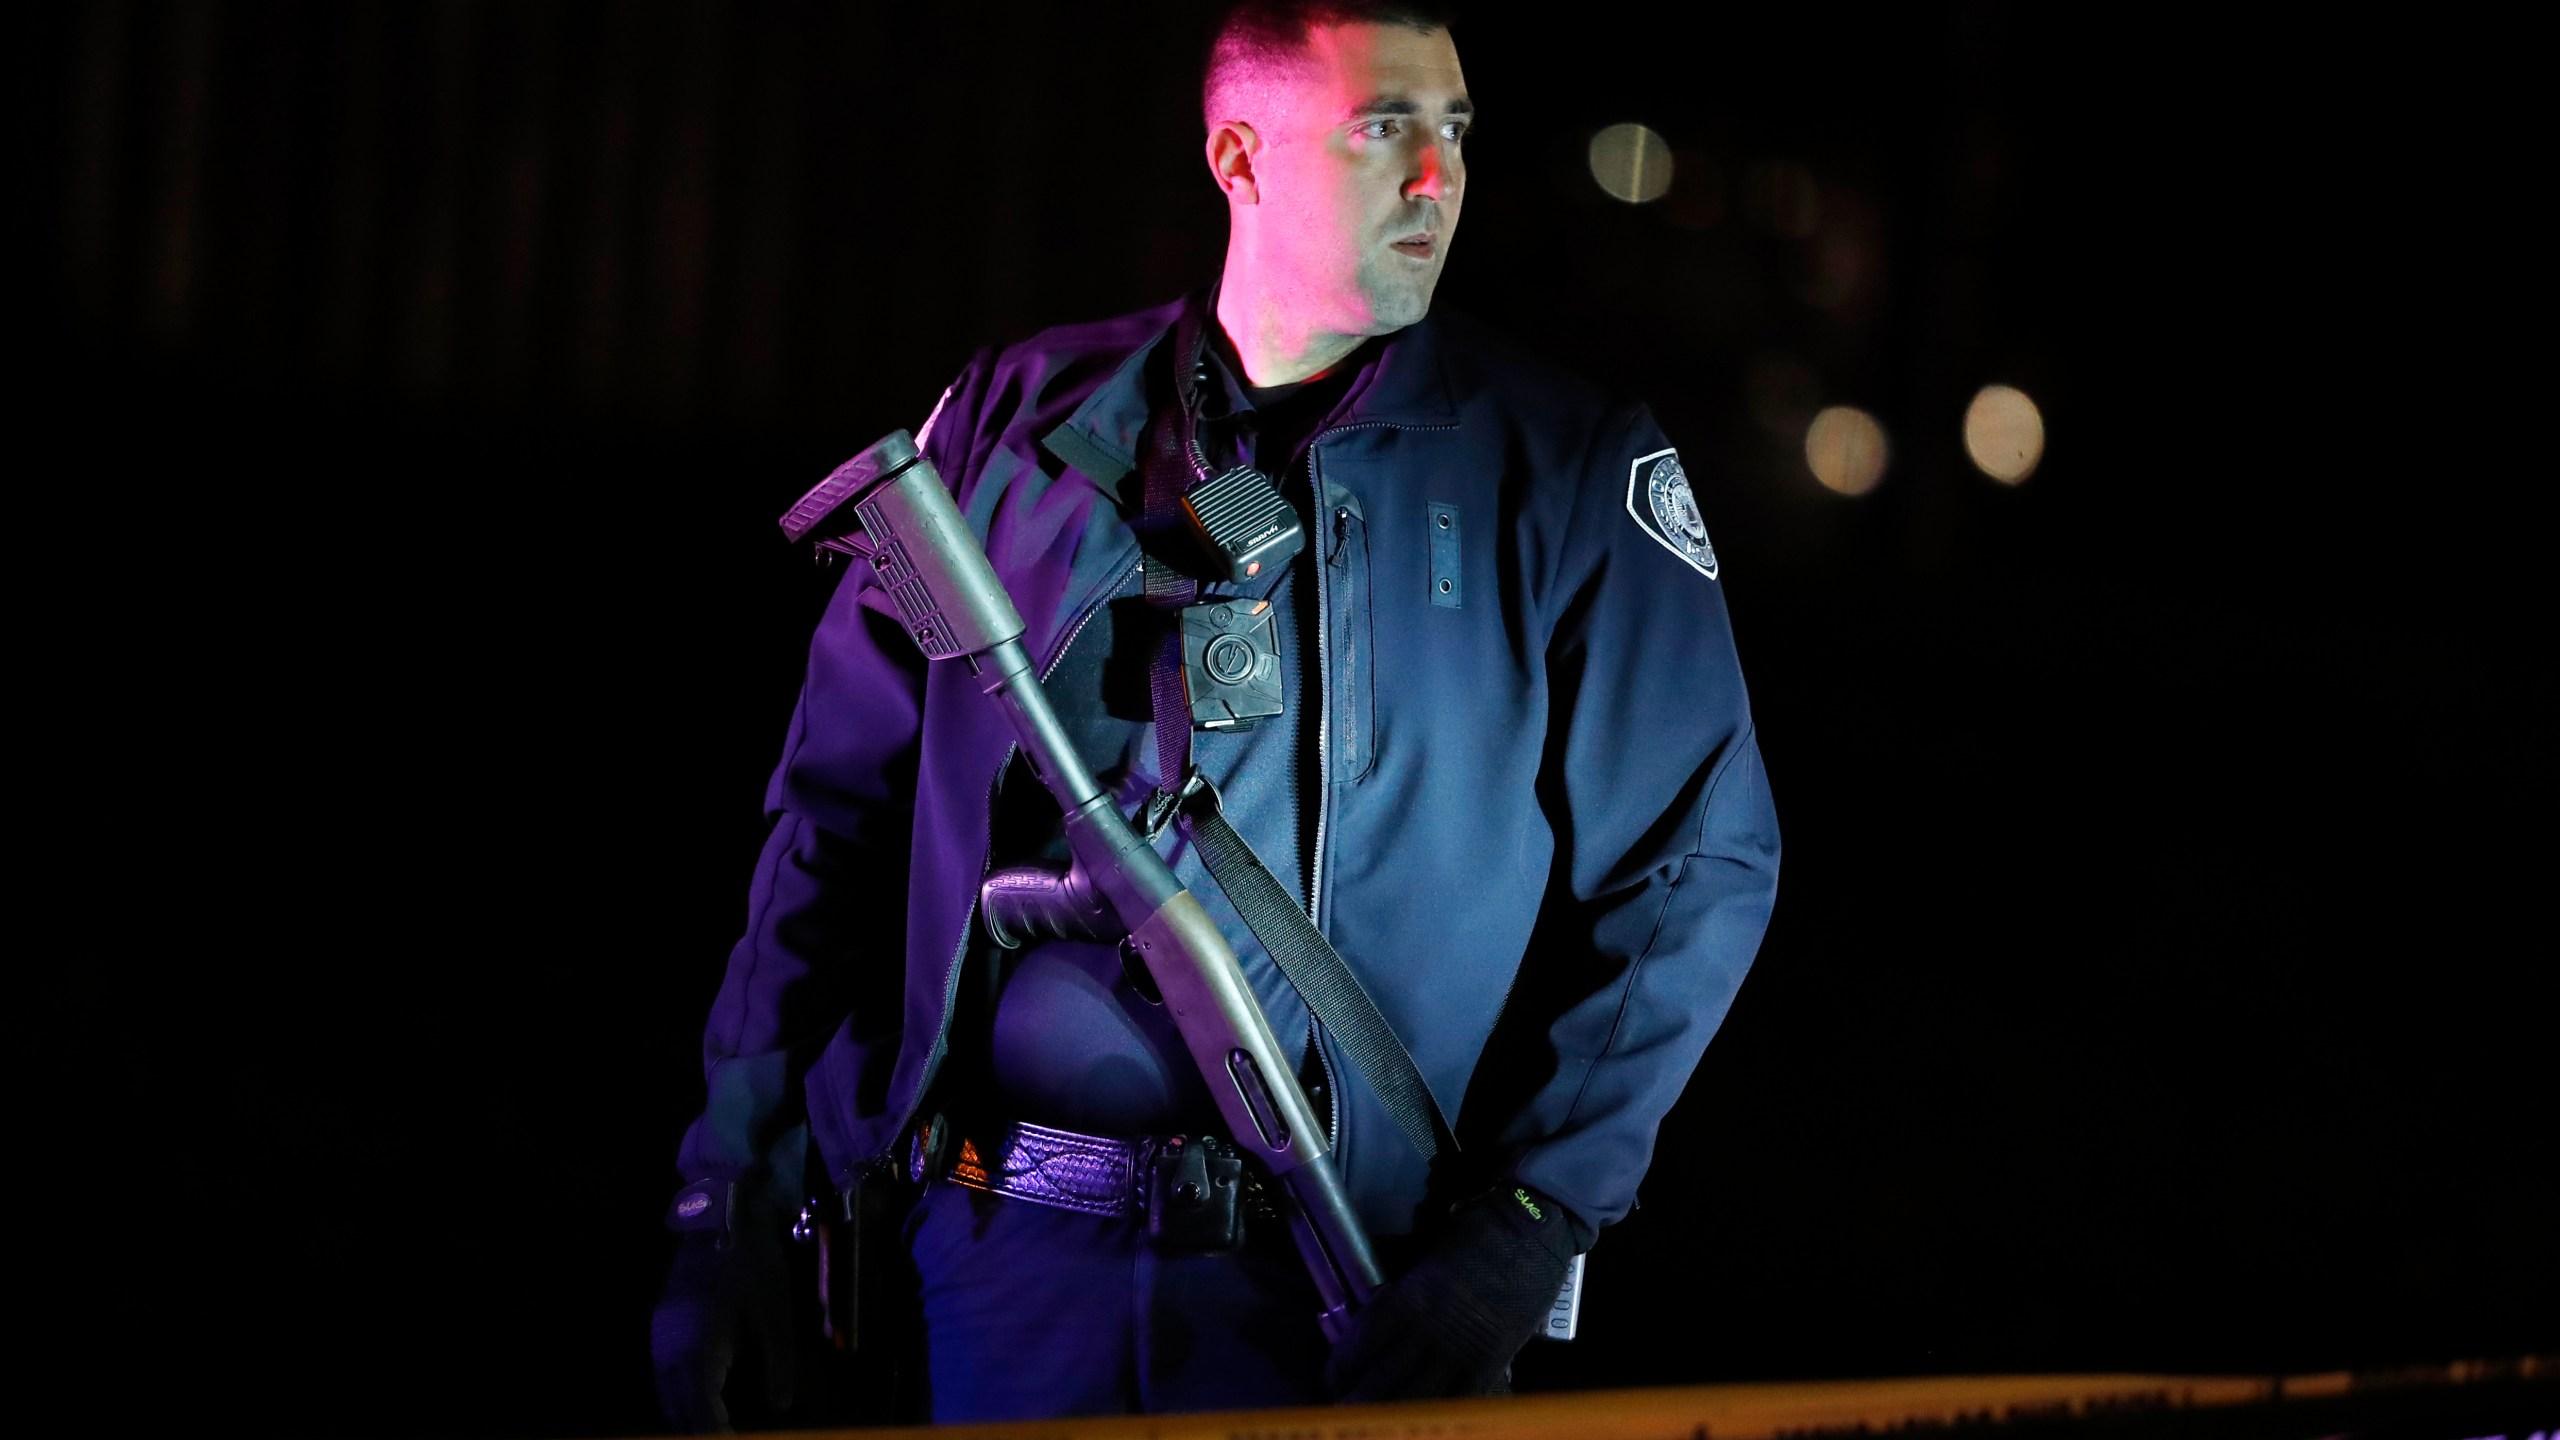 Officers Killed Iowa Photo by Charlie Neibergall, AP Photo_236885